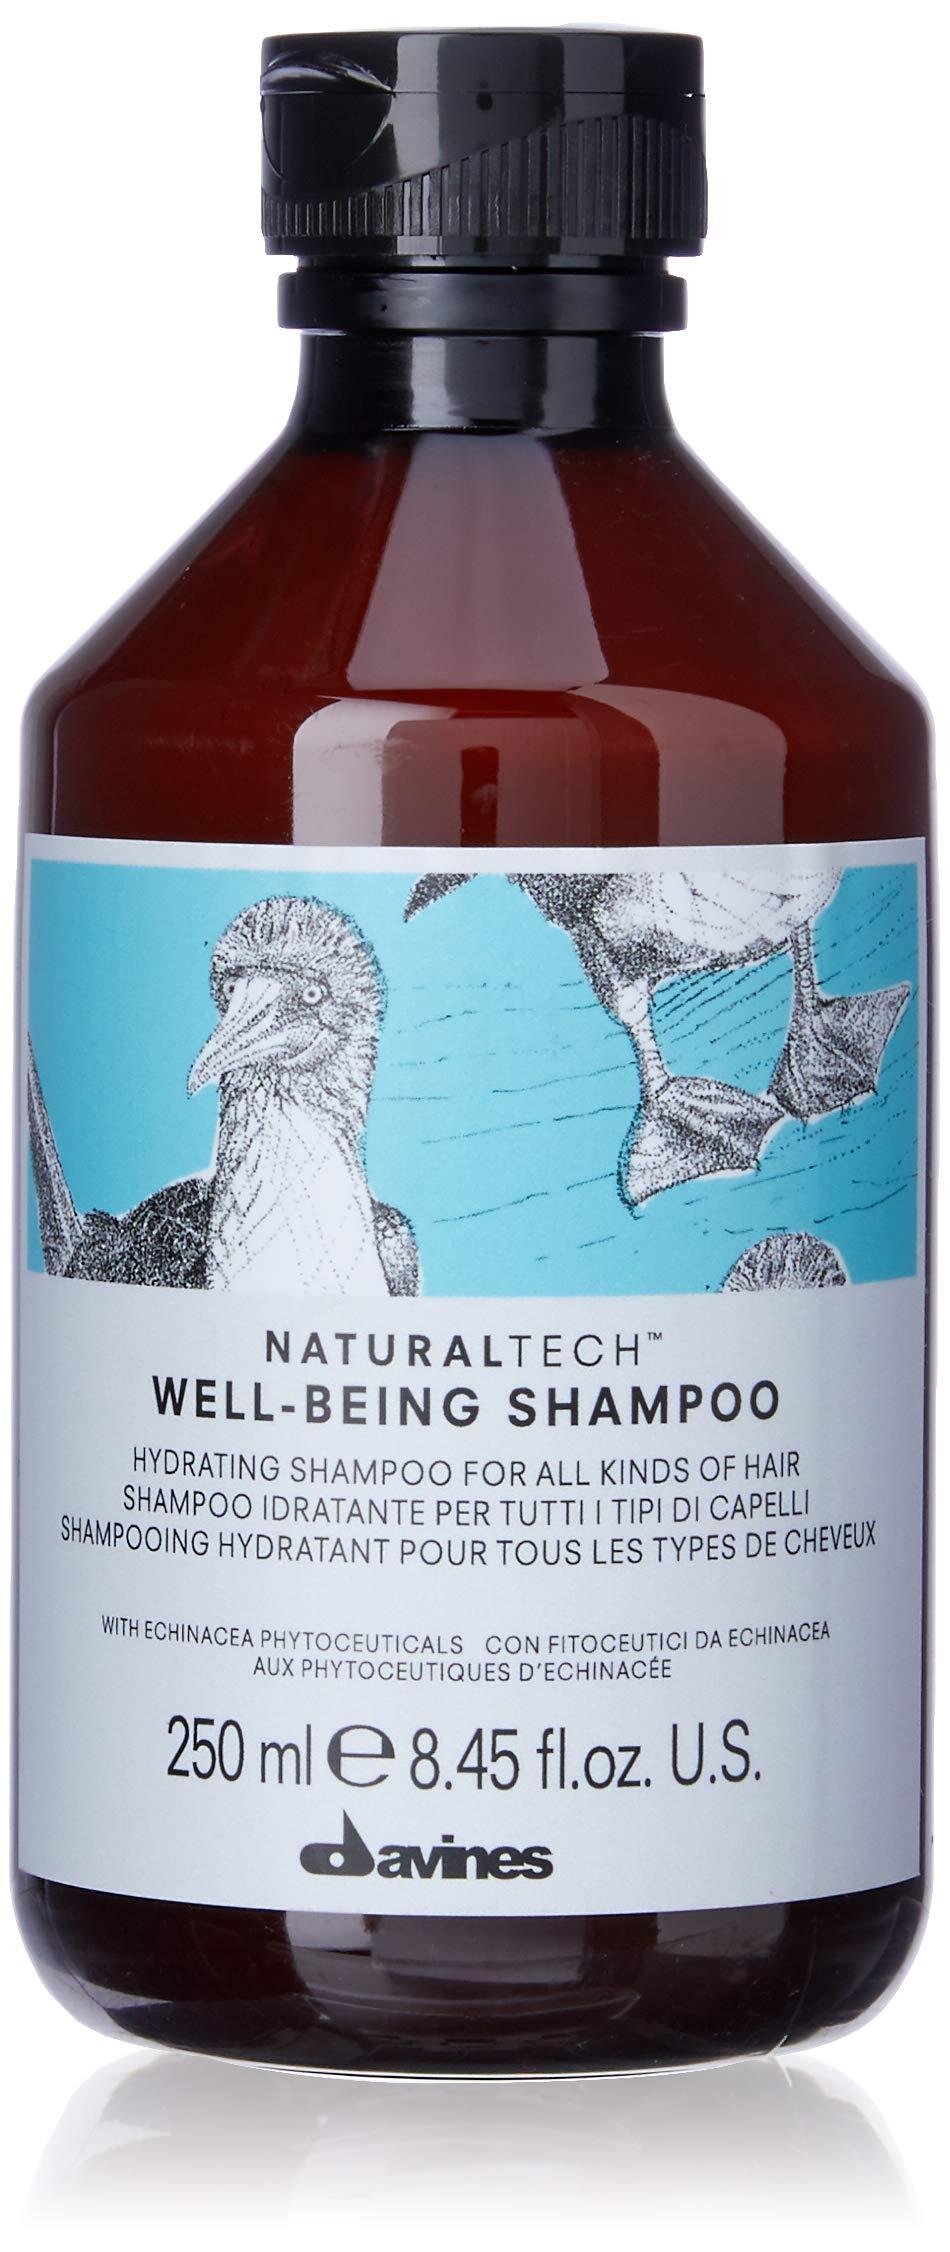 Davines Well-Being Shampoo, 8.45 fl. oz.